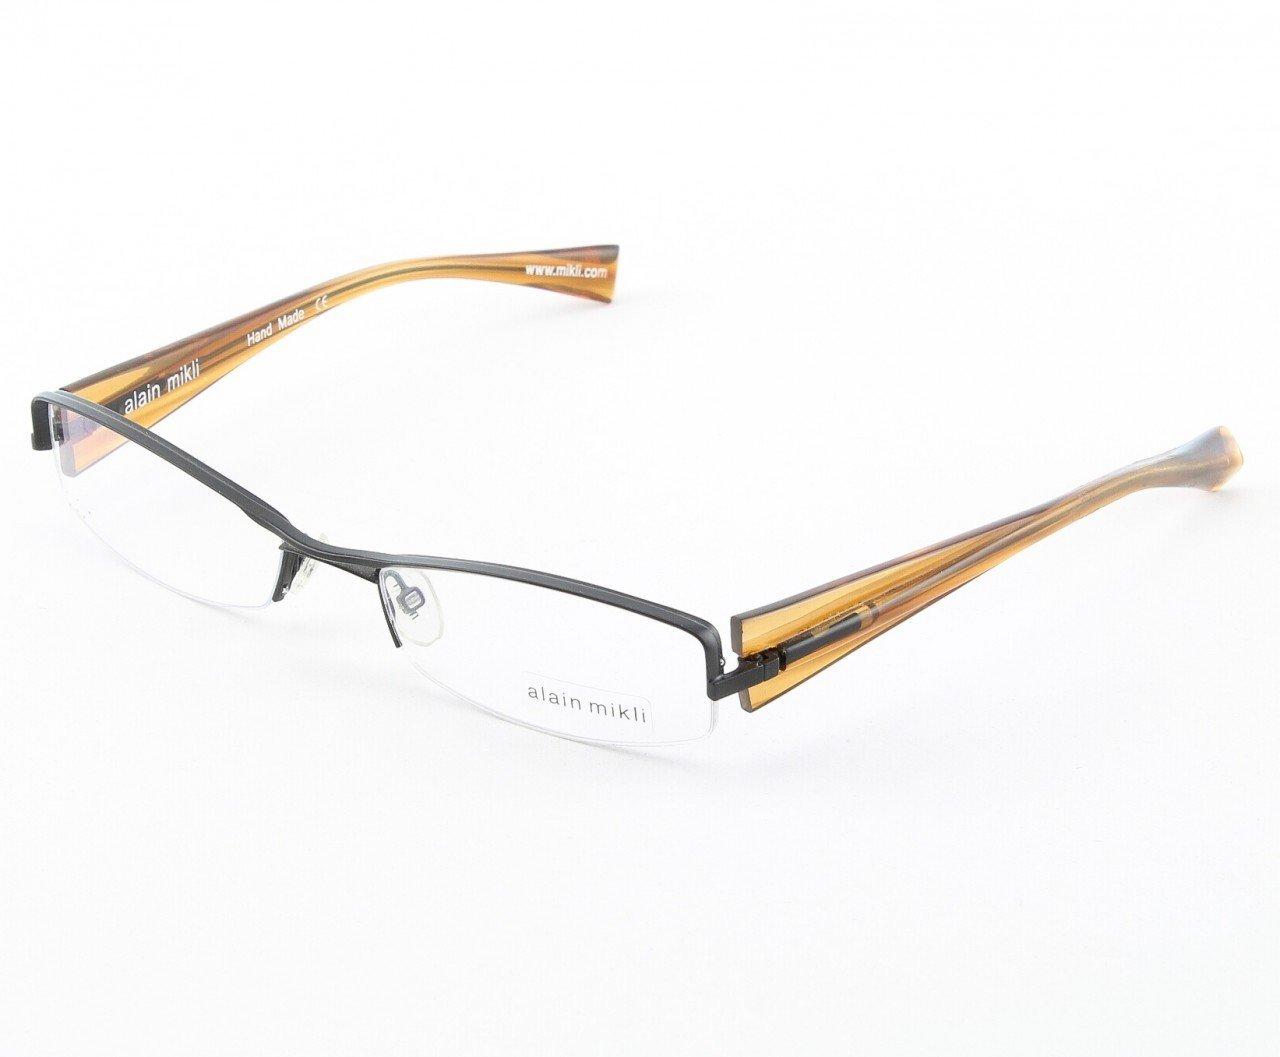 Alain Mikli Eyeglasses AL0656 Col. 12 Matte Black Metallic Frame with Clear Metallic Temples